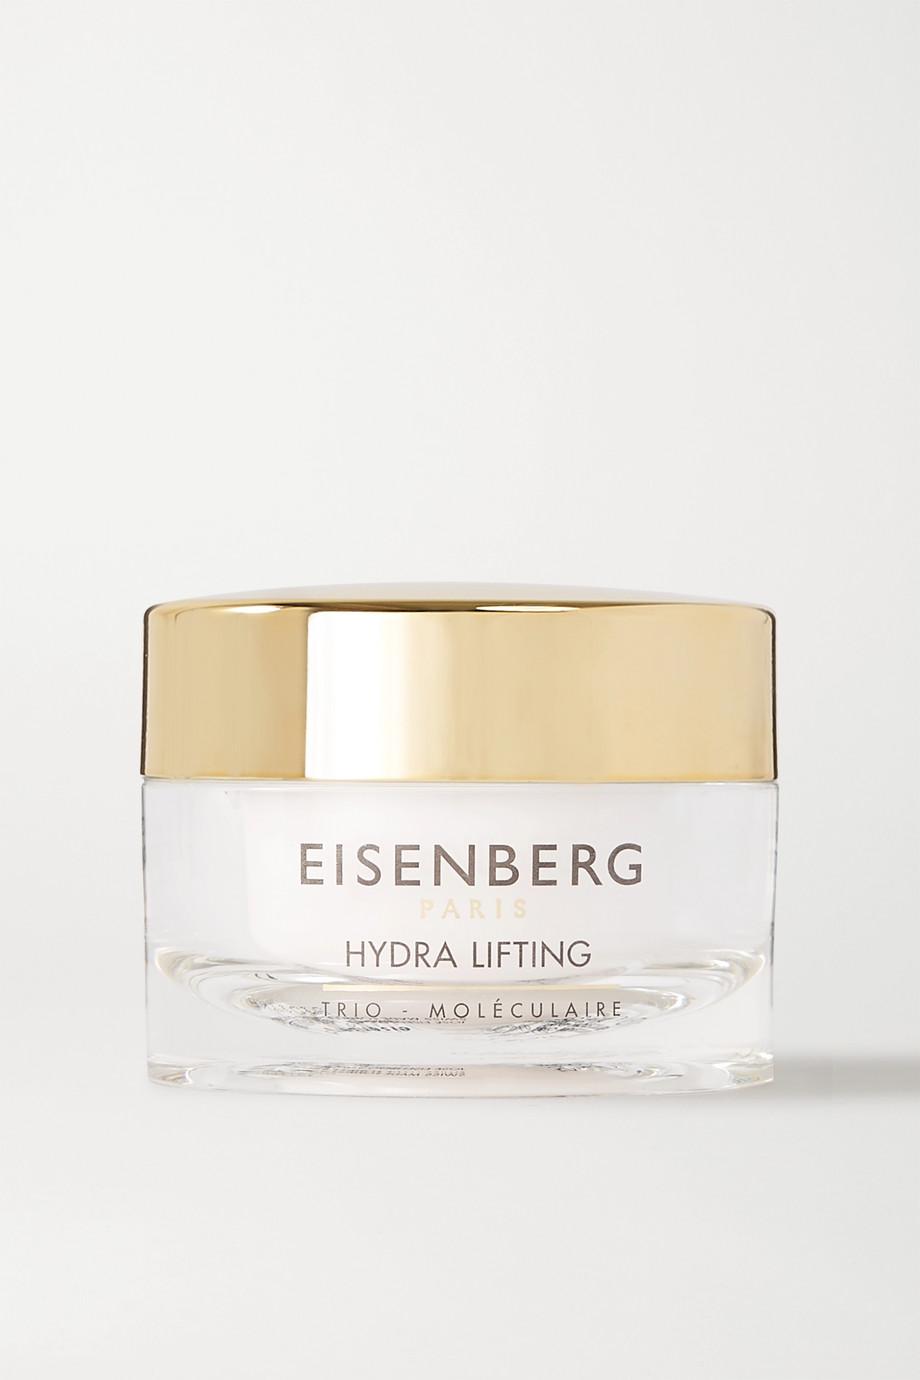 EISENBERG Paris Hydra Lifting Treatment, 50 ml – Gel-Creme